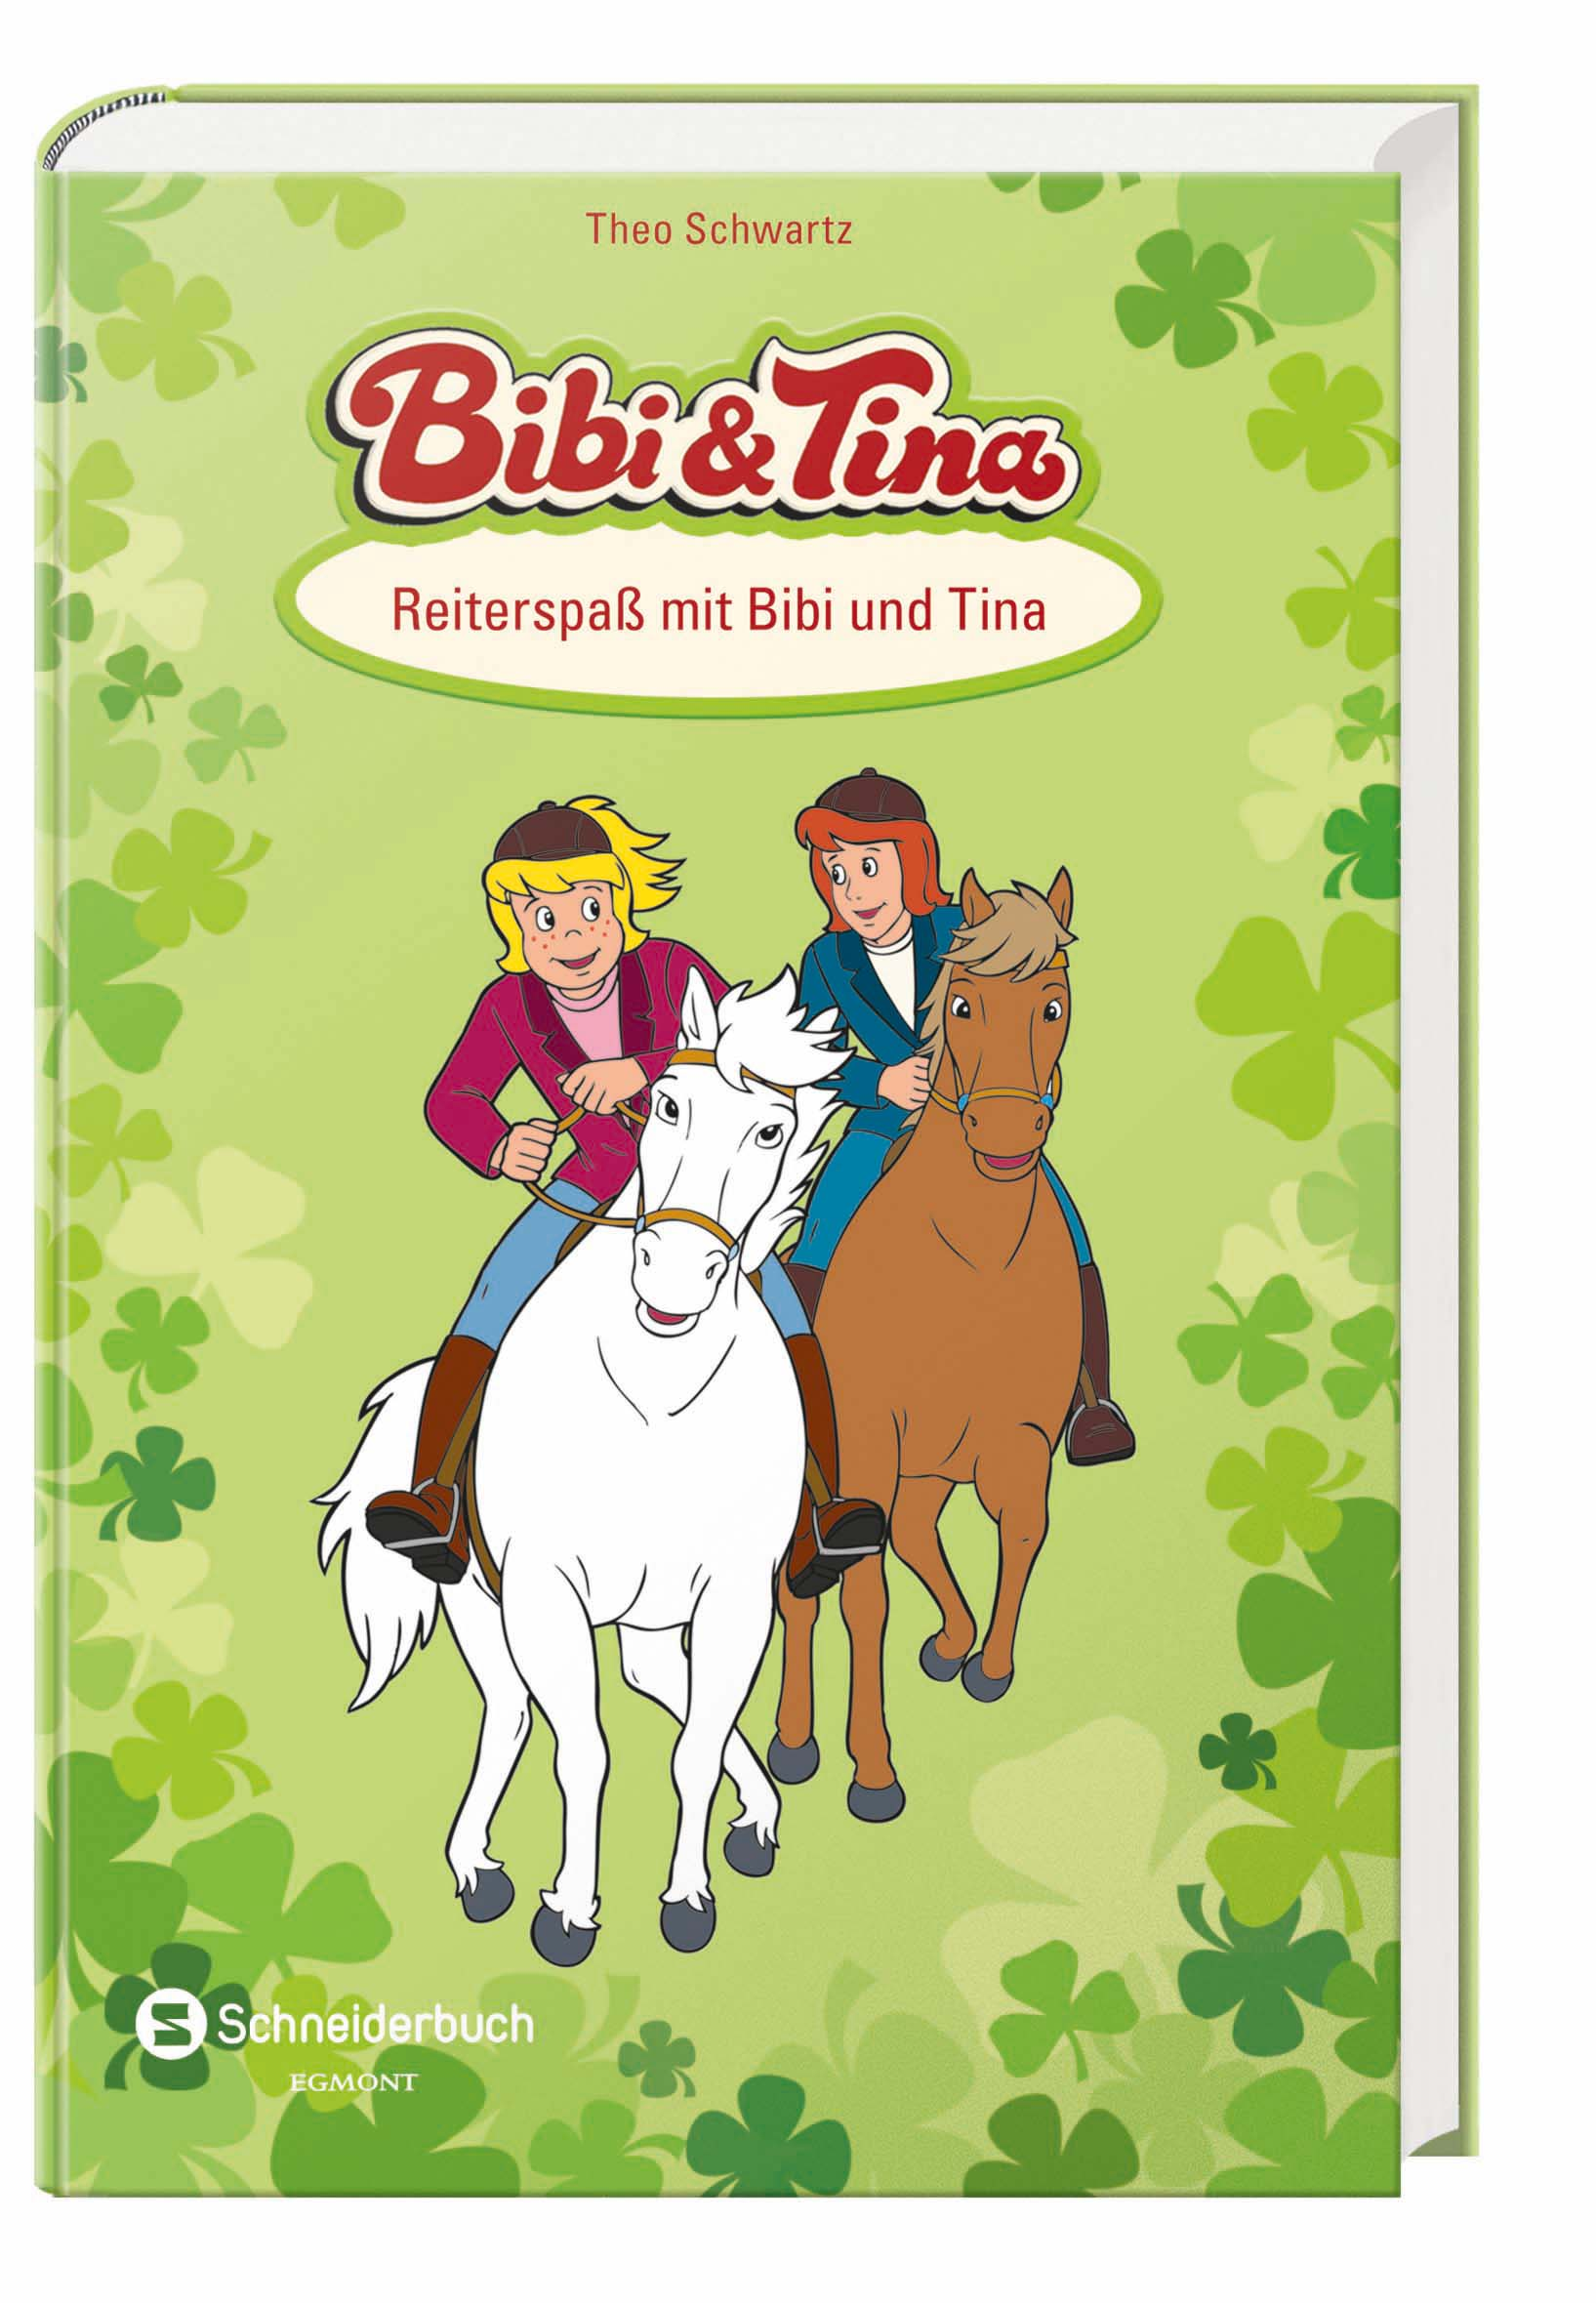 Bibi & Tina: Reiterspaß (Sammelband)